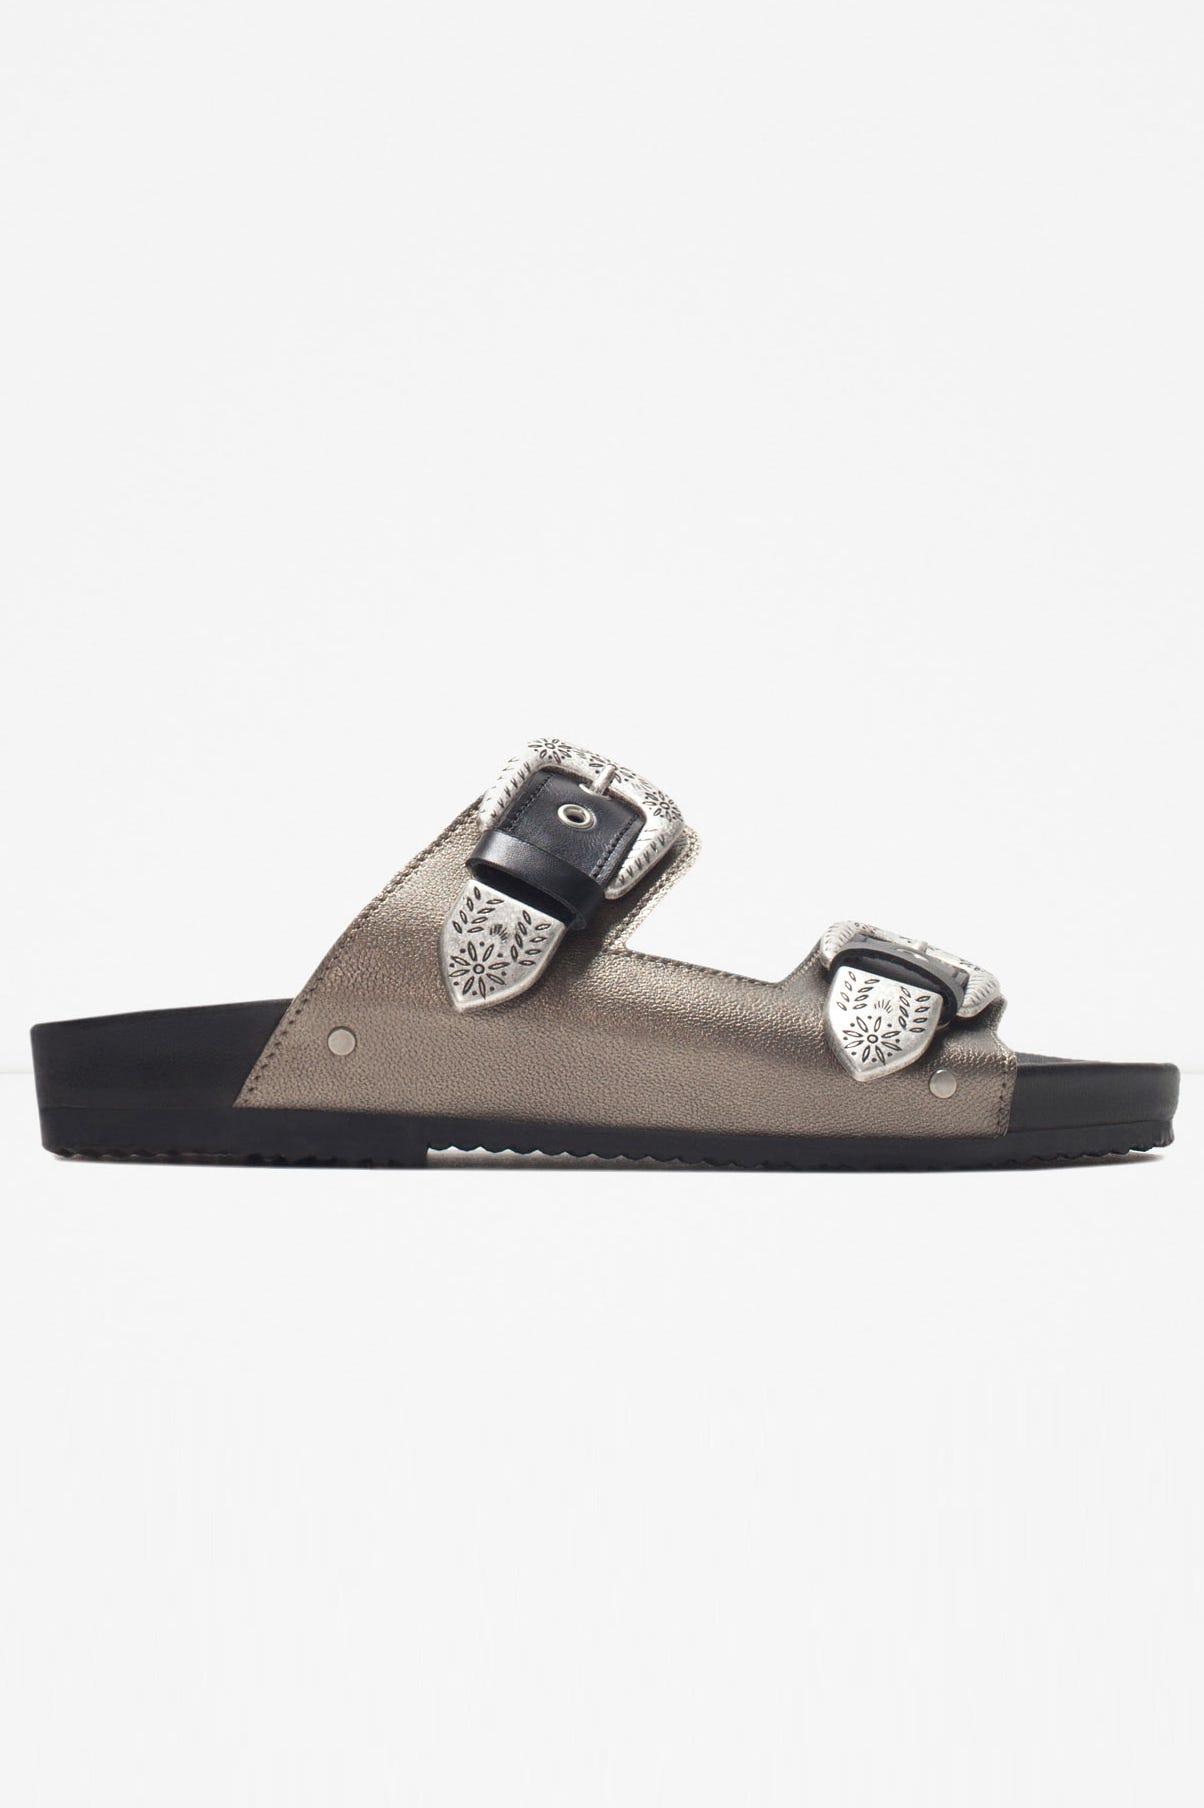 f09e810d13c543 Zara. Leather Cowboy Sandals